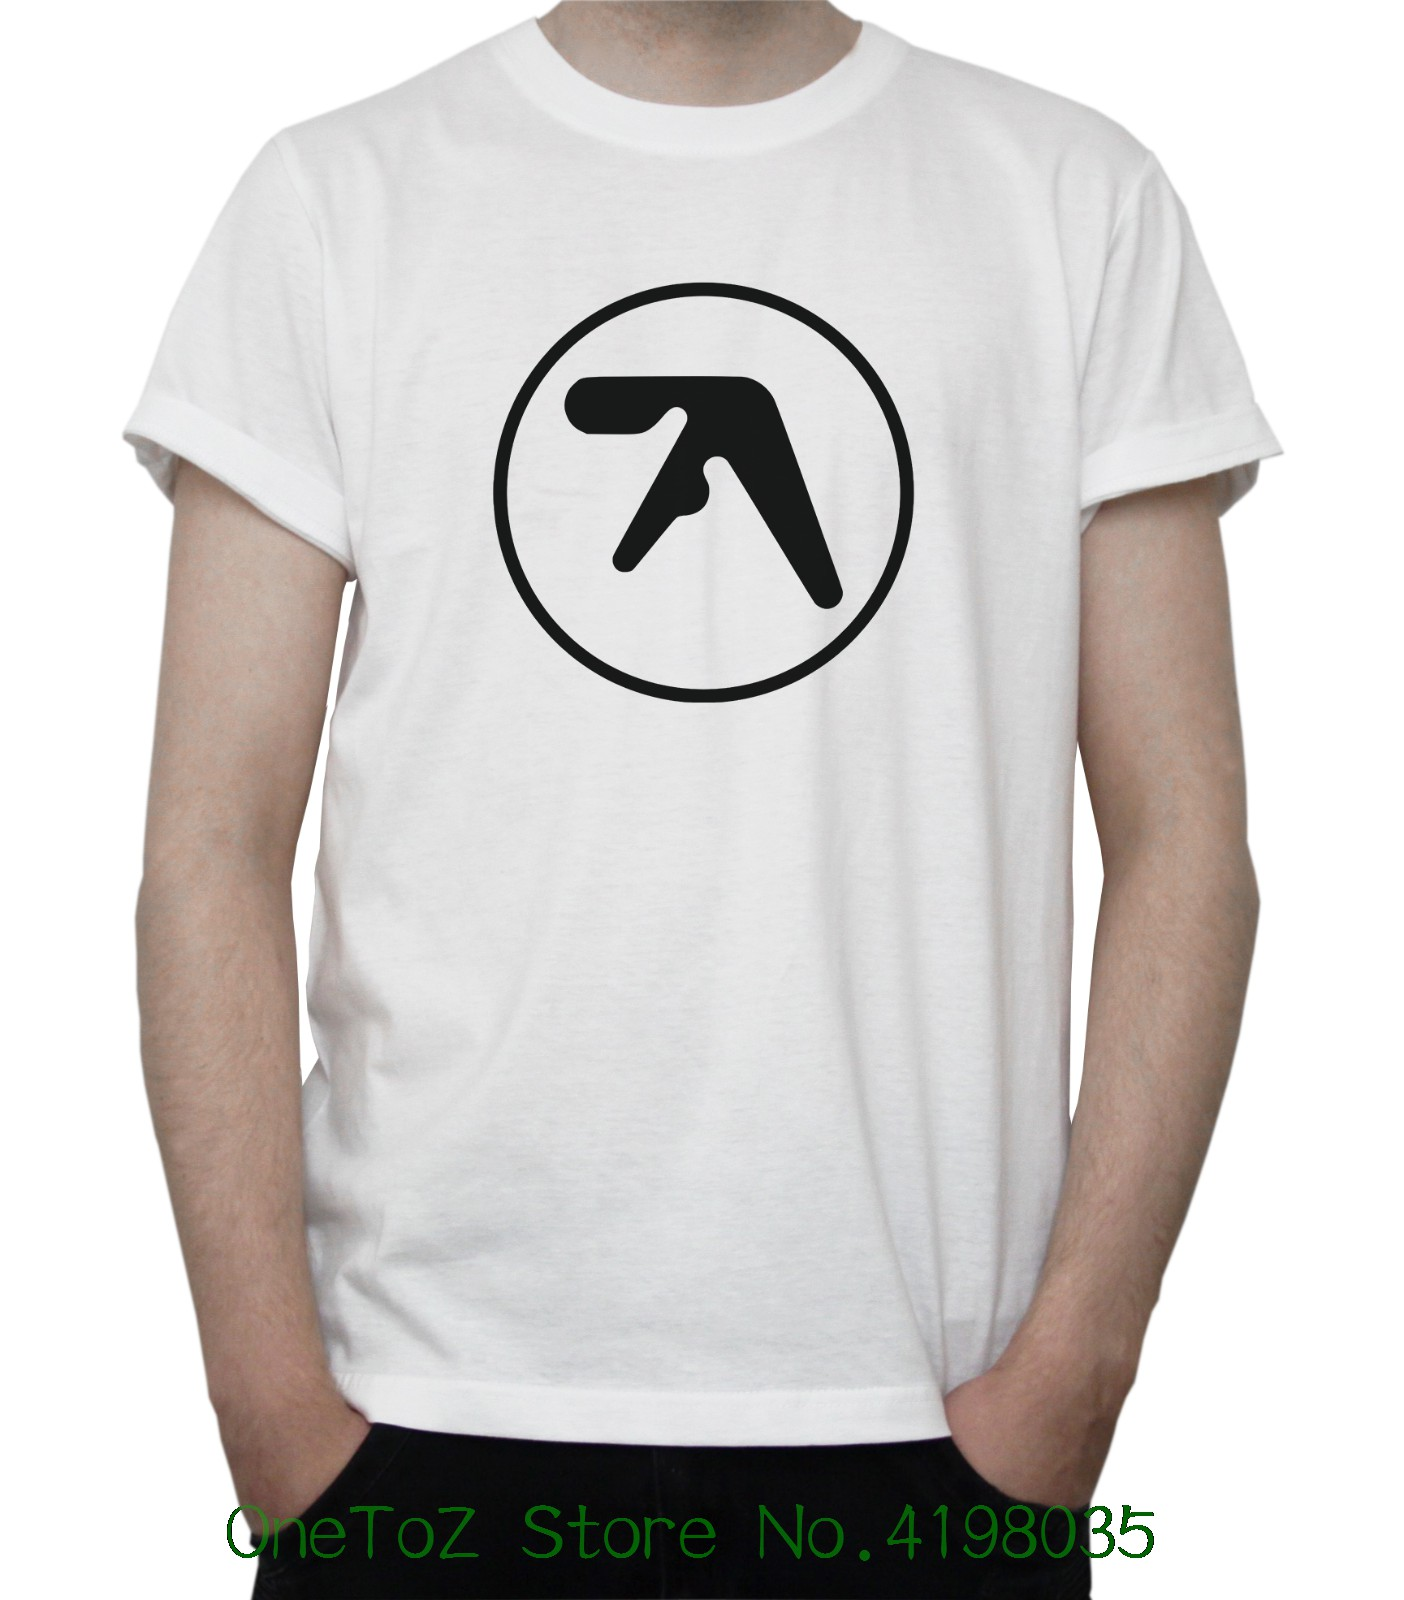 Aphex Twin Logo T-shirt Electronic Music Techno Hardcore Windowlicker Grey White Short Sleeve Cool Casual